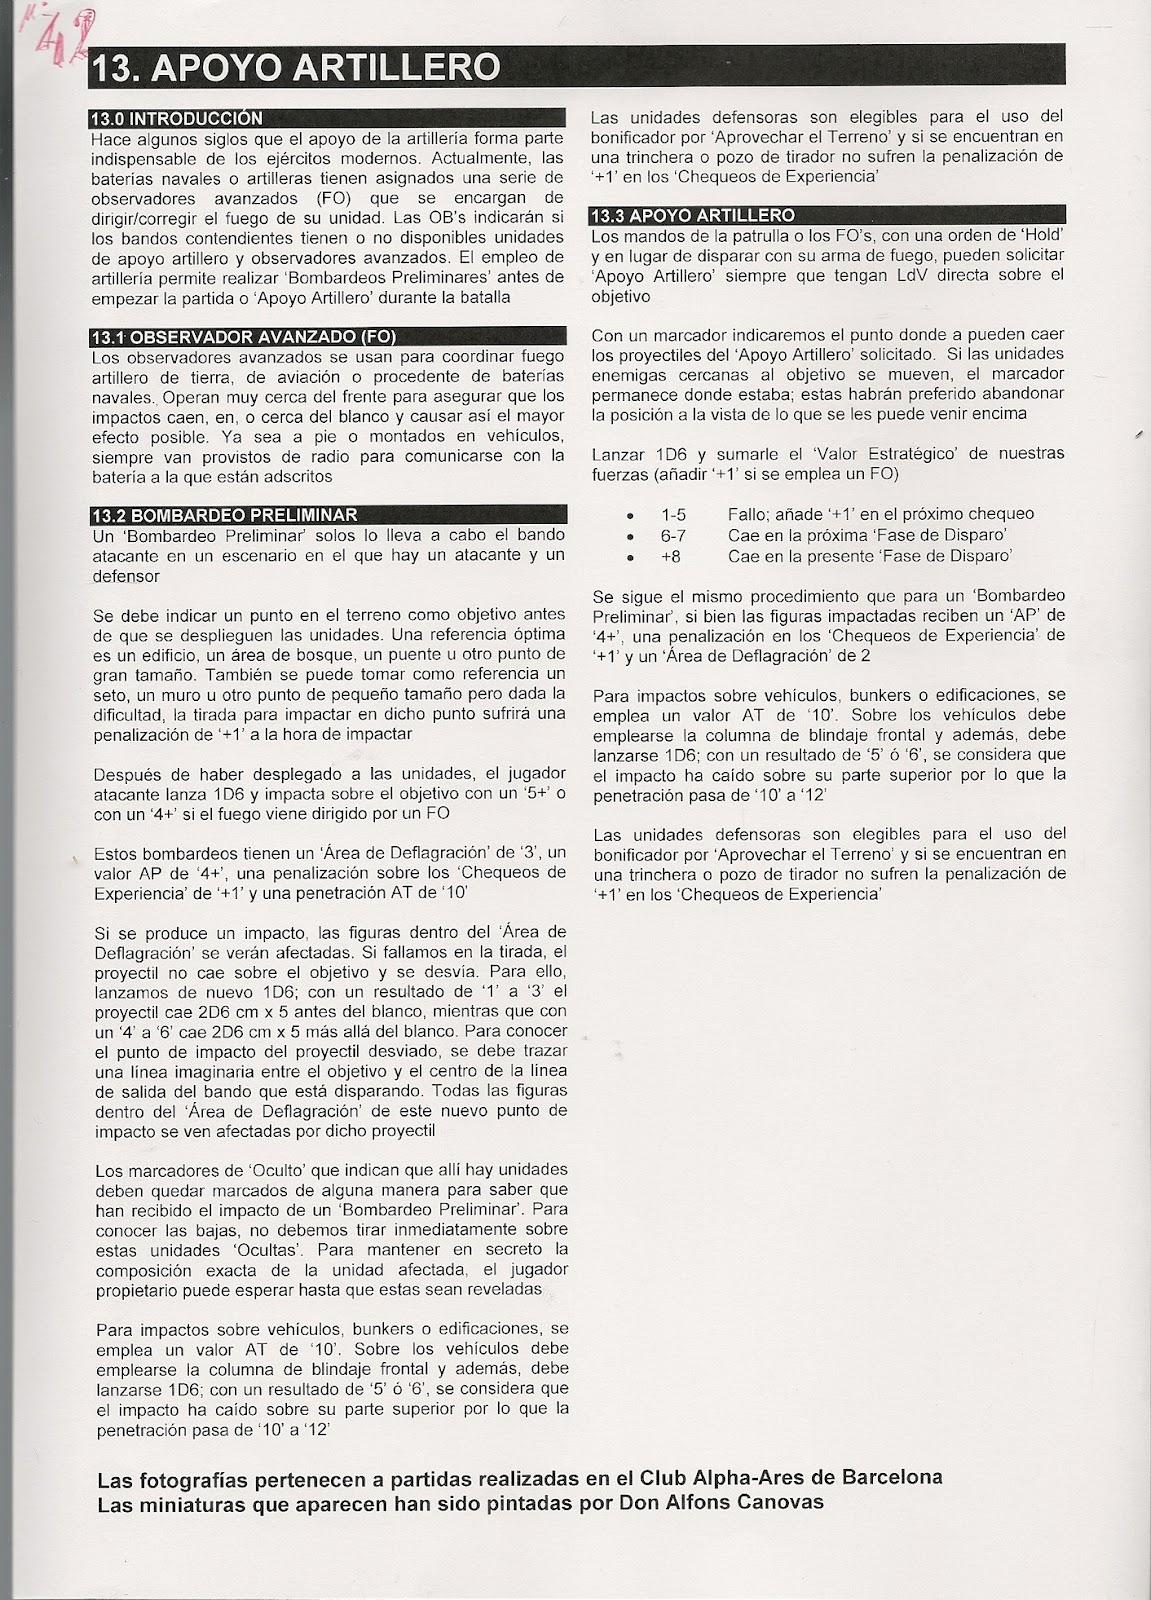 MINIATURAS MILITARES POR ALFONS CÀNOVAS: REGLAMENTO de la